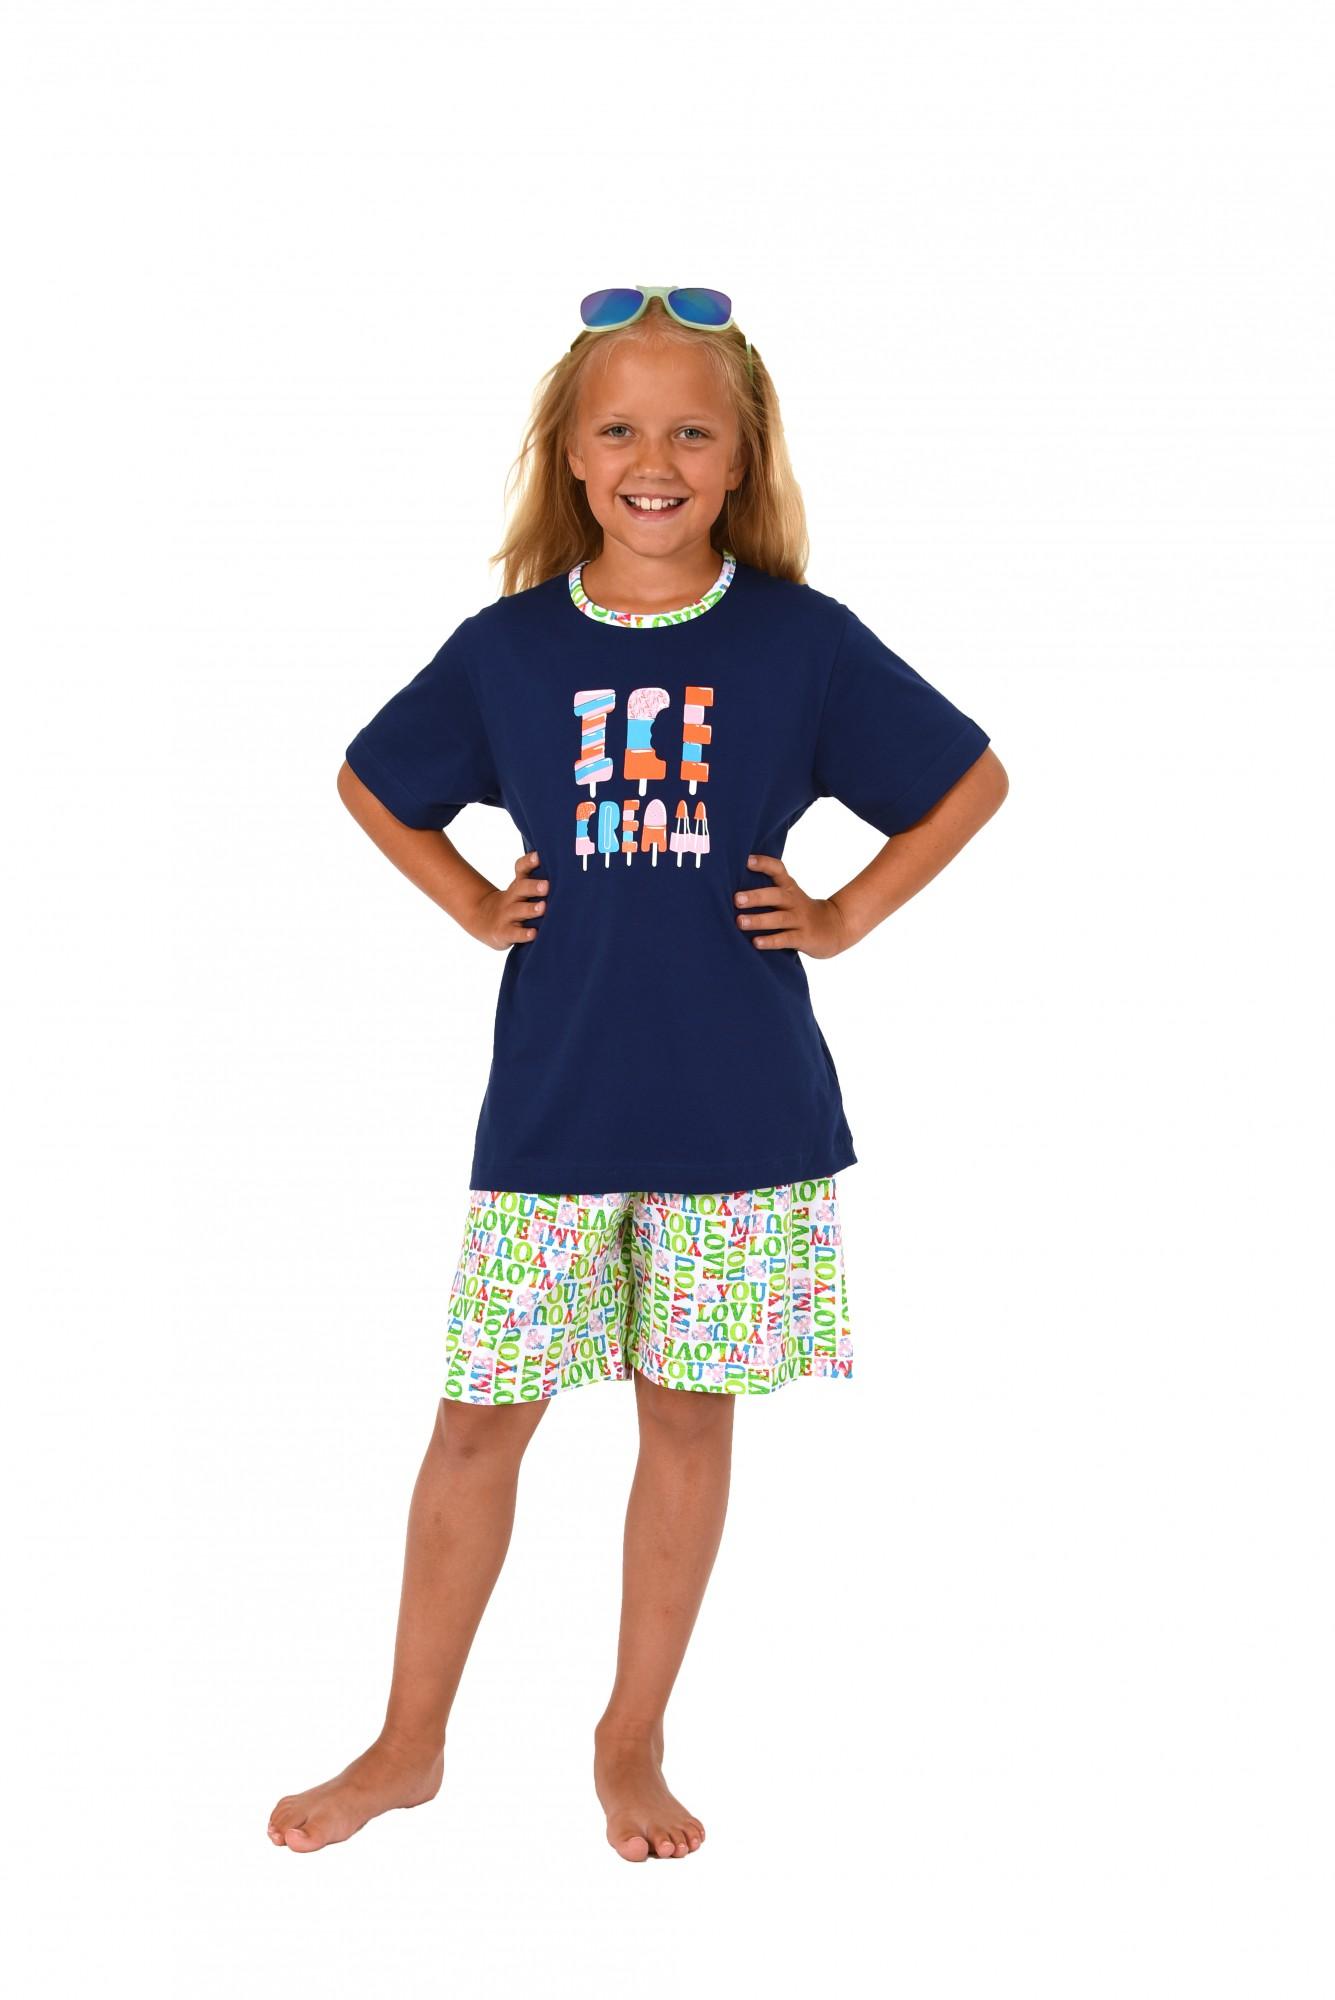 1d2ea10e64 Cooler Mädchen Kinder Pyjama Shorty kurzarm in tollen Farben 171 405 90 842  – Bild 2